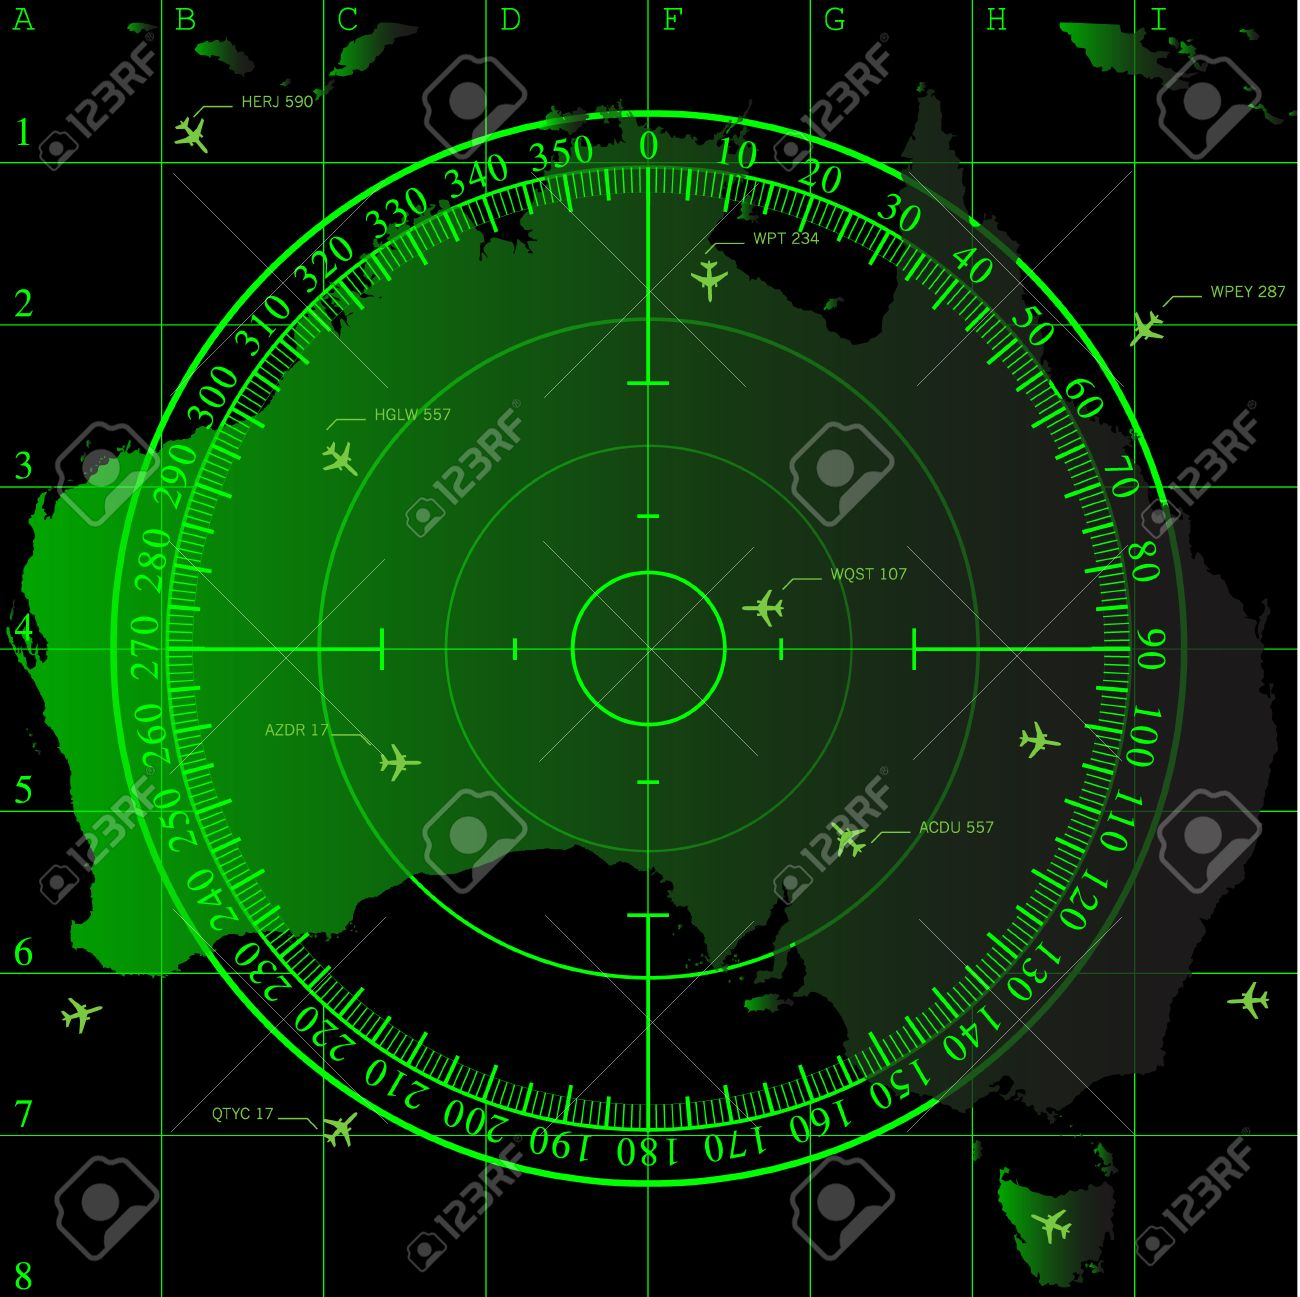 Map Of Australia Radar.Green Radar Screen Over Square Grid Lines And Map Of Australia